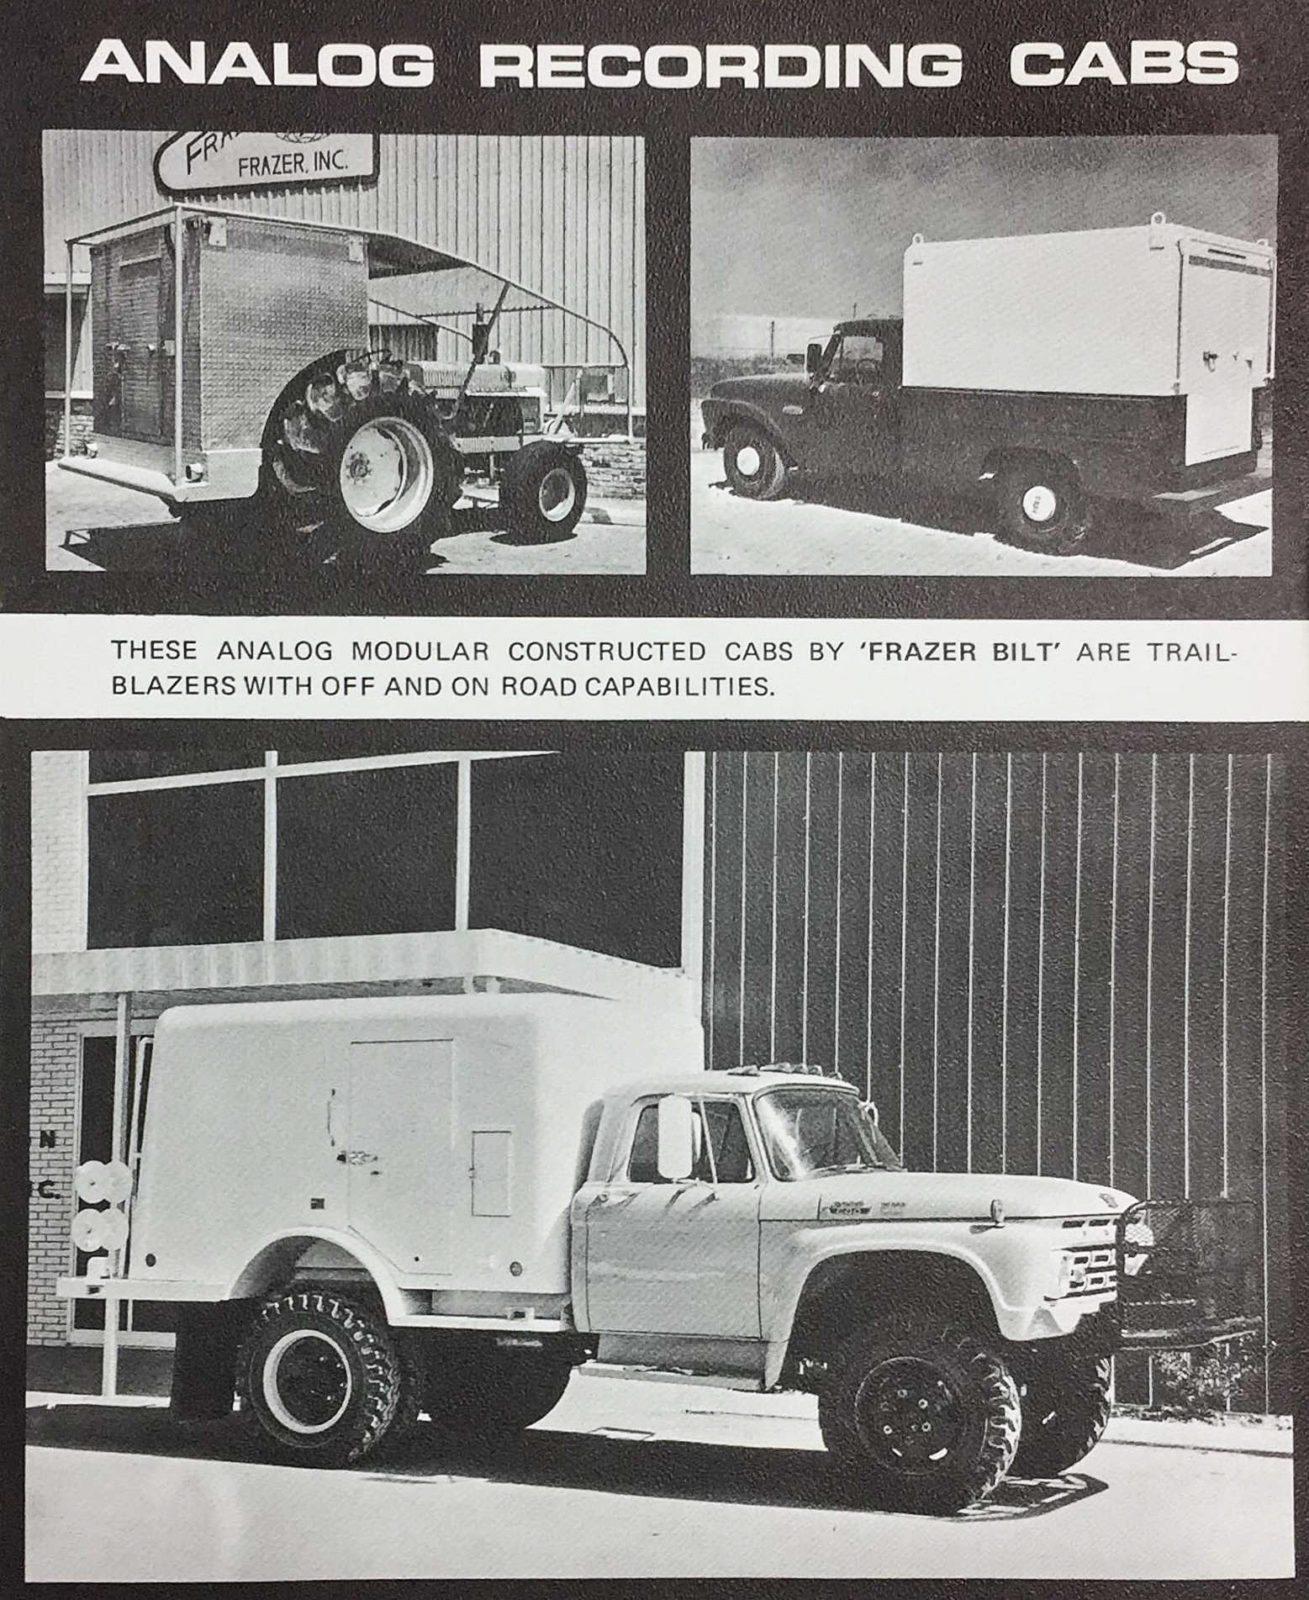 Cars Through History Timeline: The Frazer History Timeline